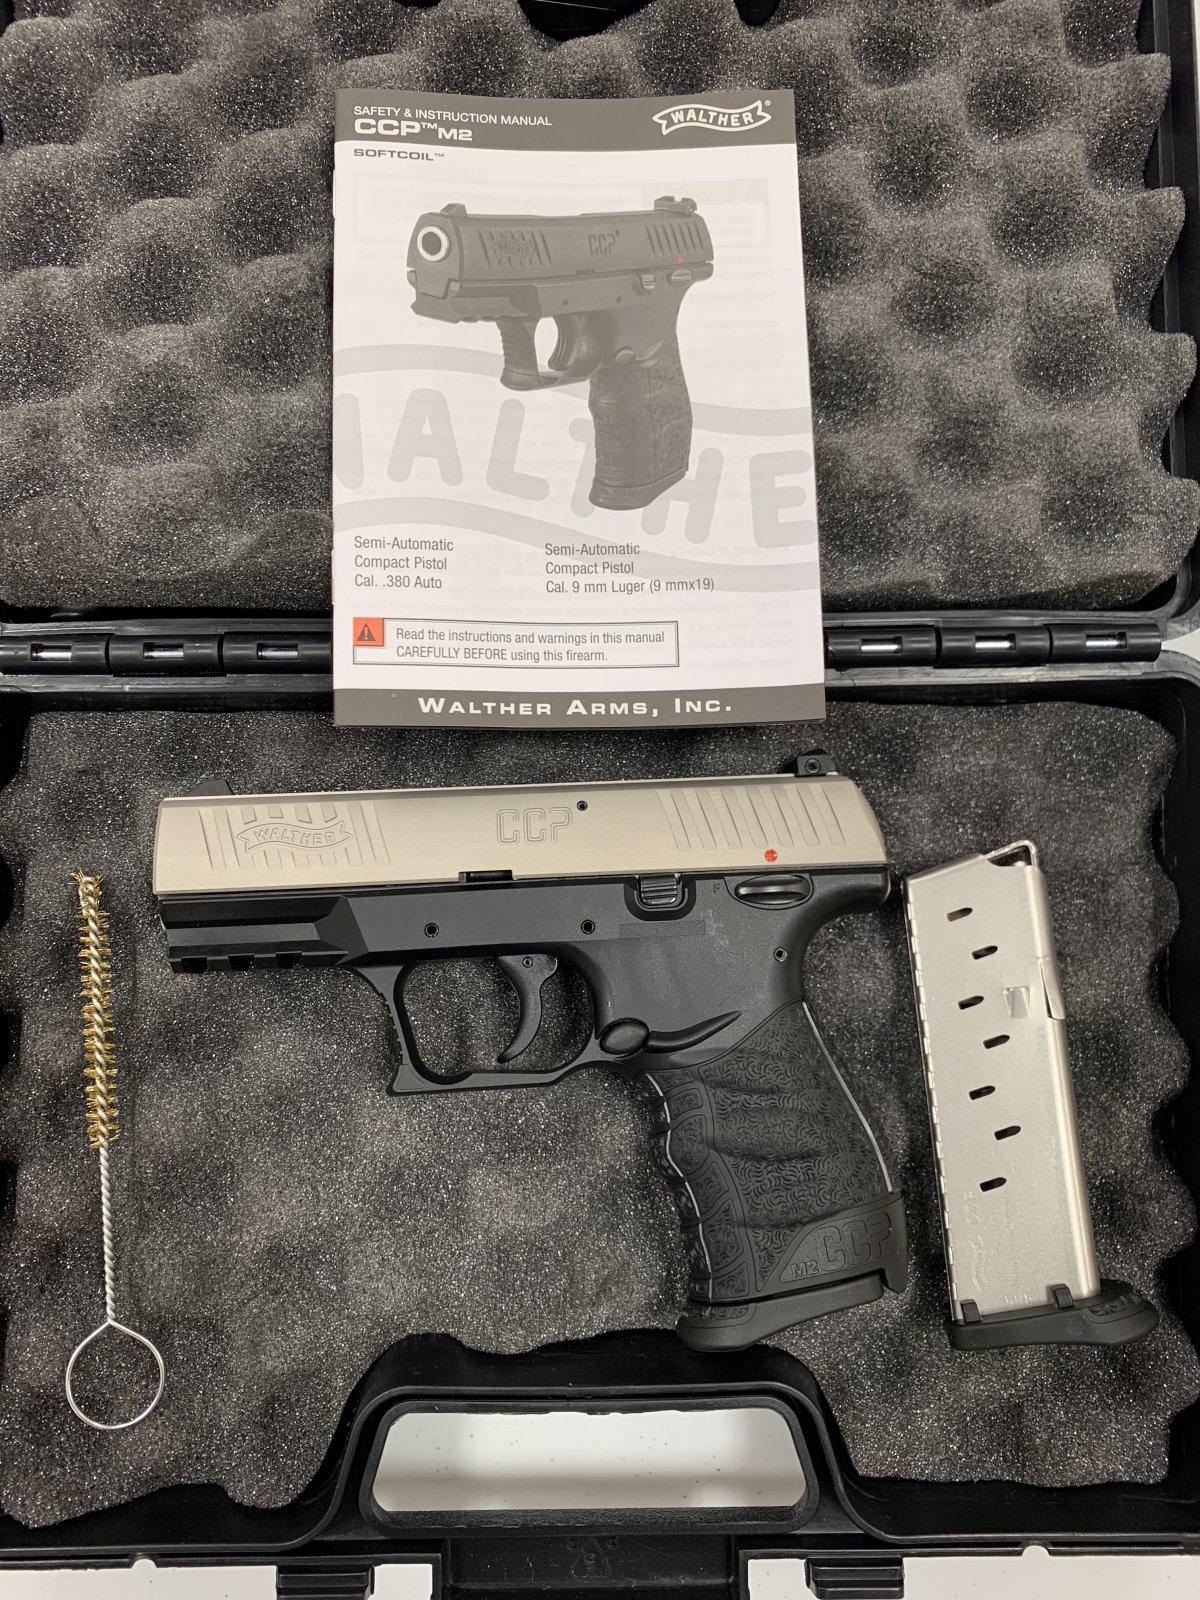 Walther CCP 380 Semi-Automatic Pistol